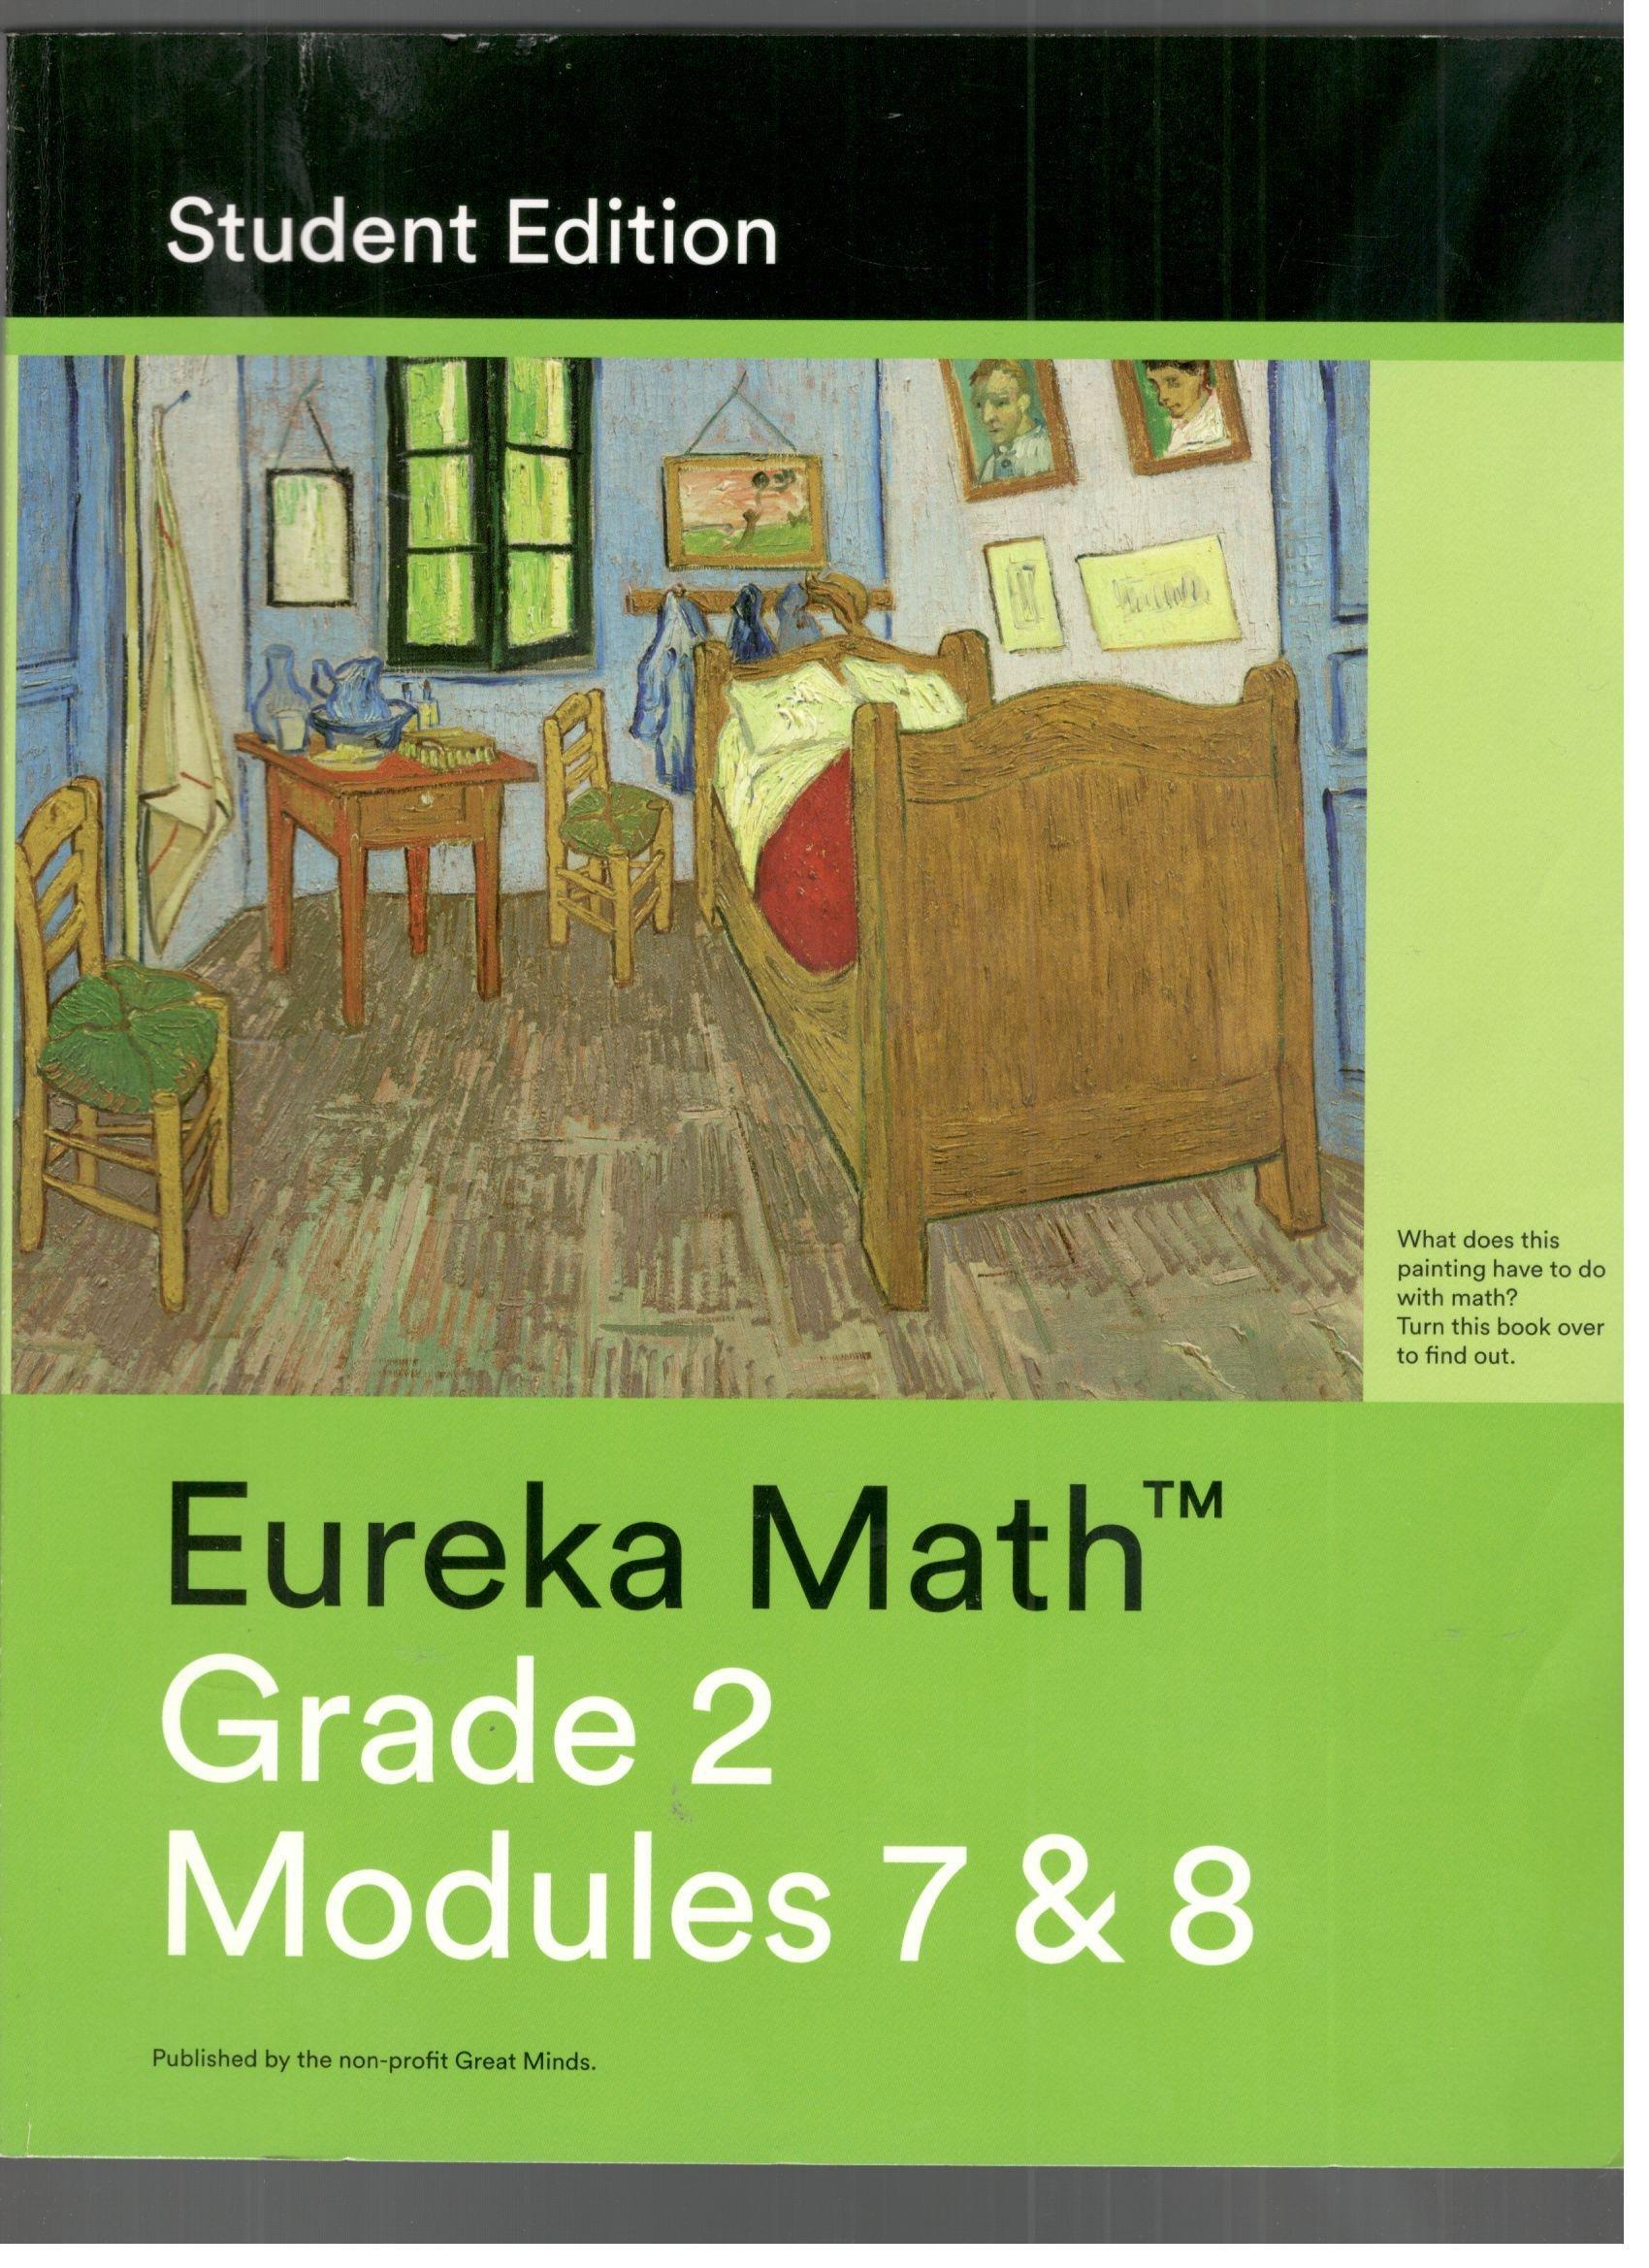 Eureka Math Grade 2 modules 7 and 8 (Student Edition): Great